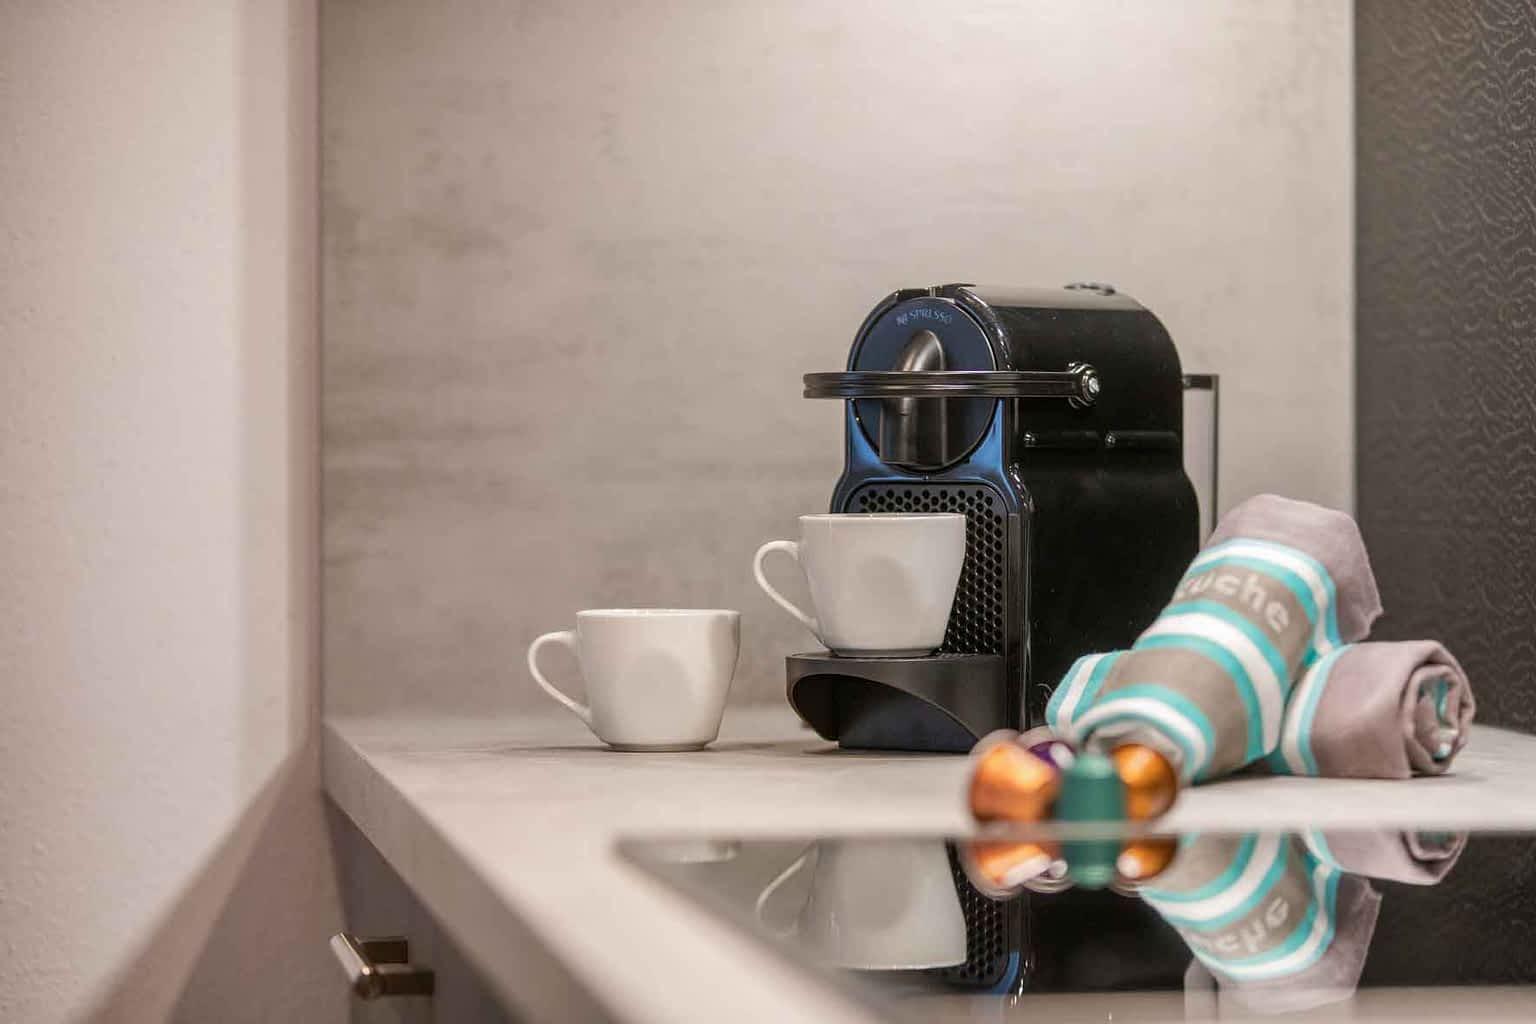 Kaffeemaschine, Geschirrspüler, Backofen, Toaster, Wasserkocher, Mikrowelle